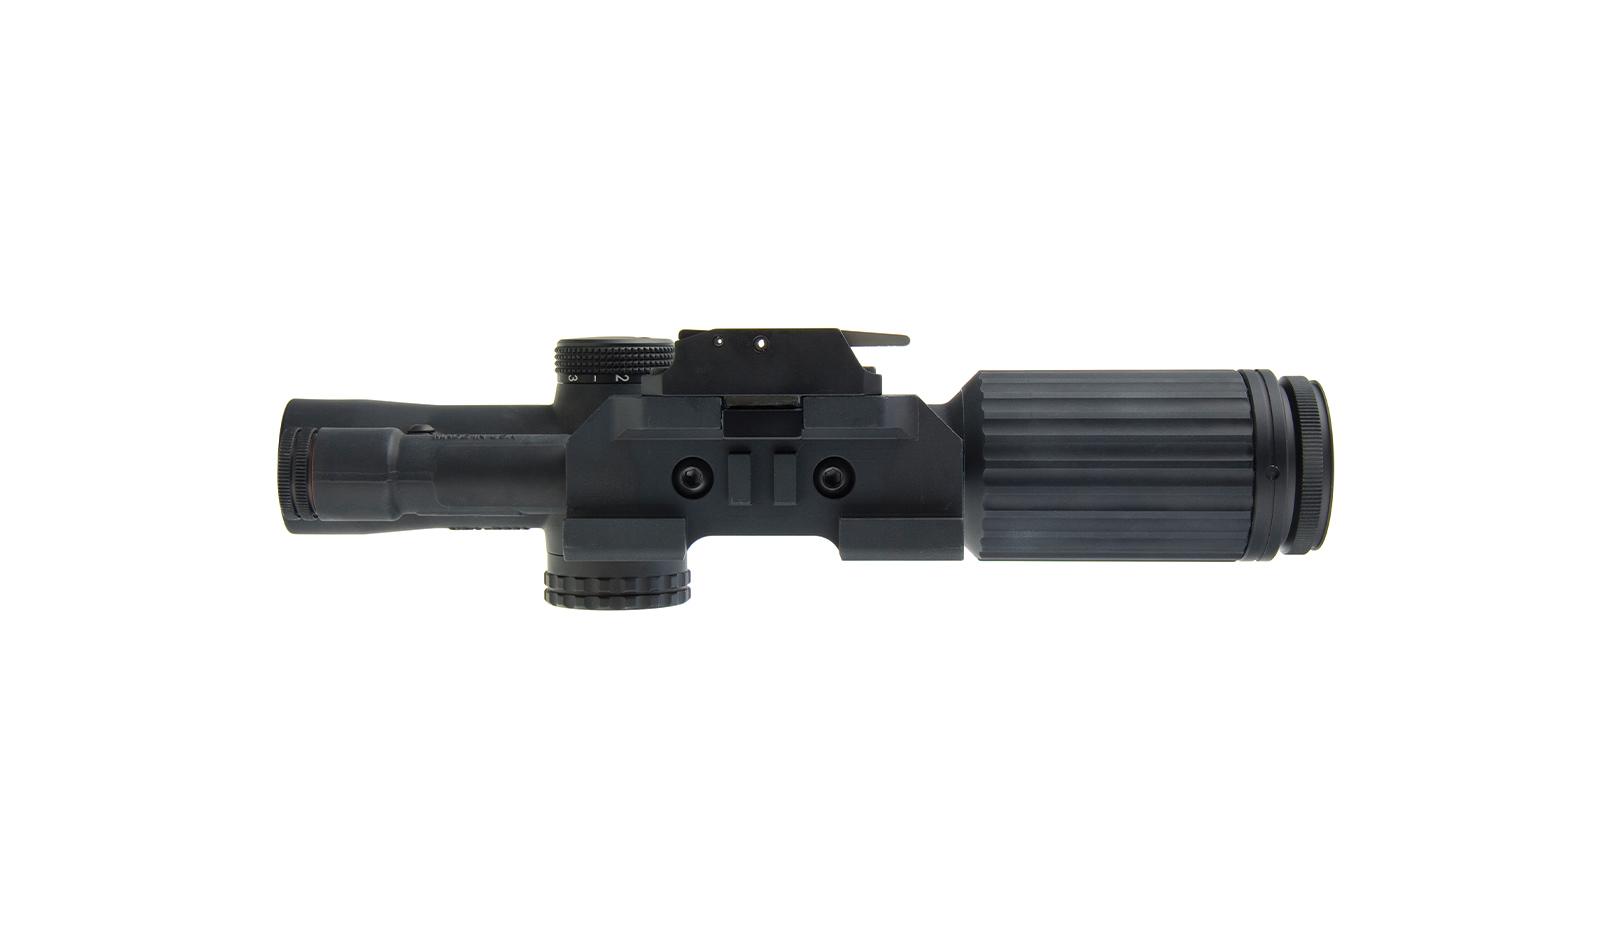 VC16-C-1600050 angle 10